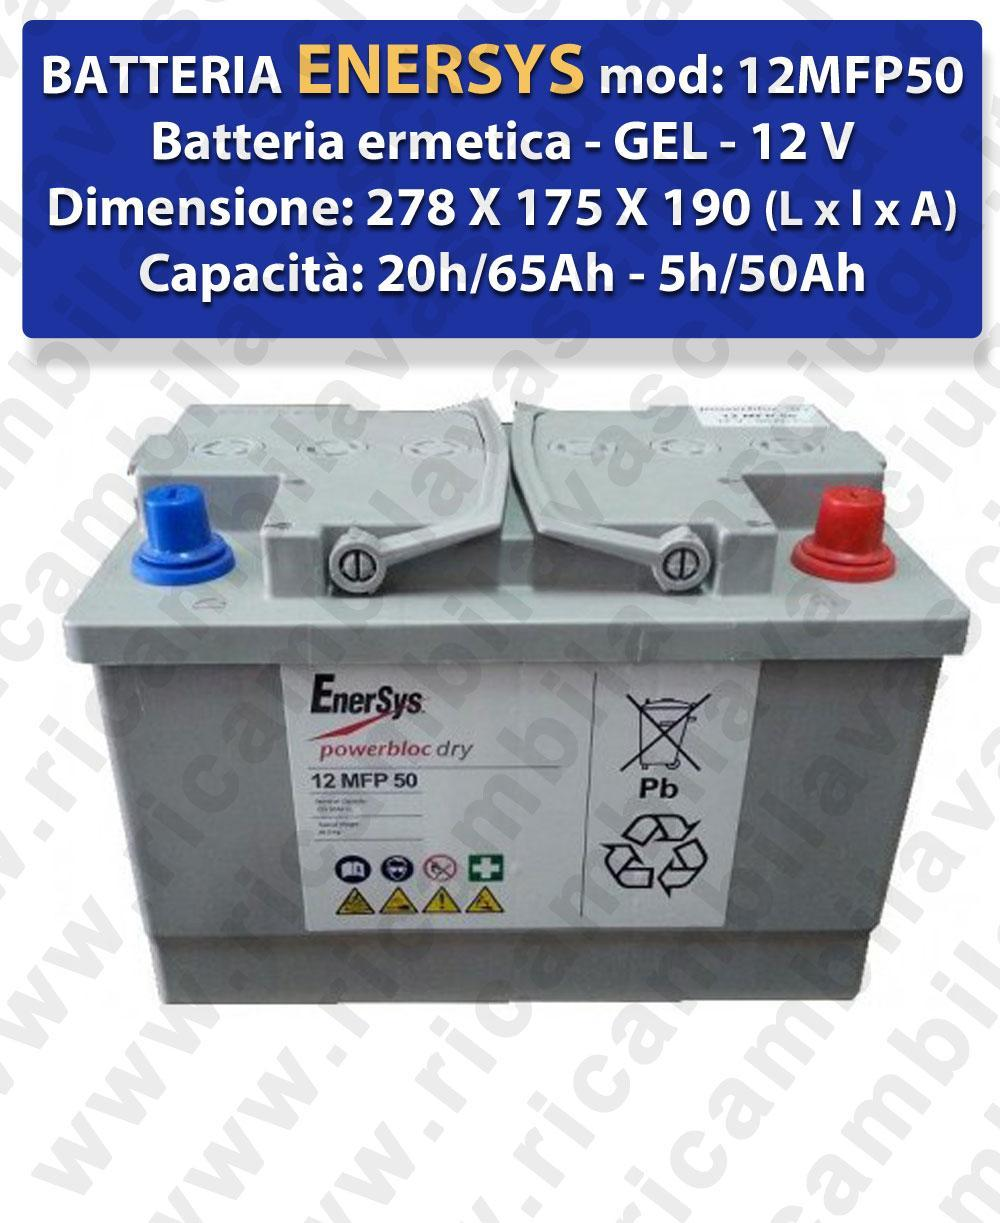 12MFP50 Battery  GEL  - ENERSYS - 12V 65Ah 20/h